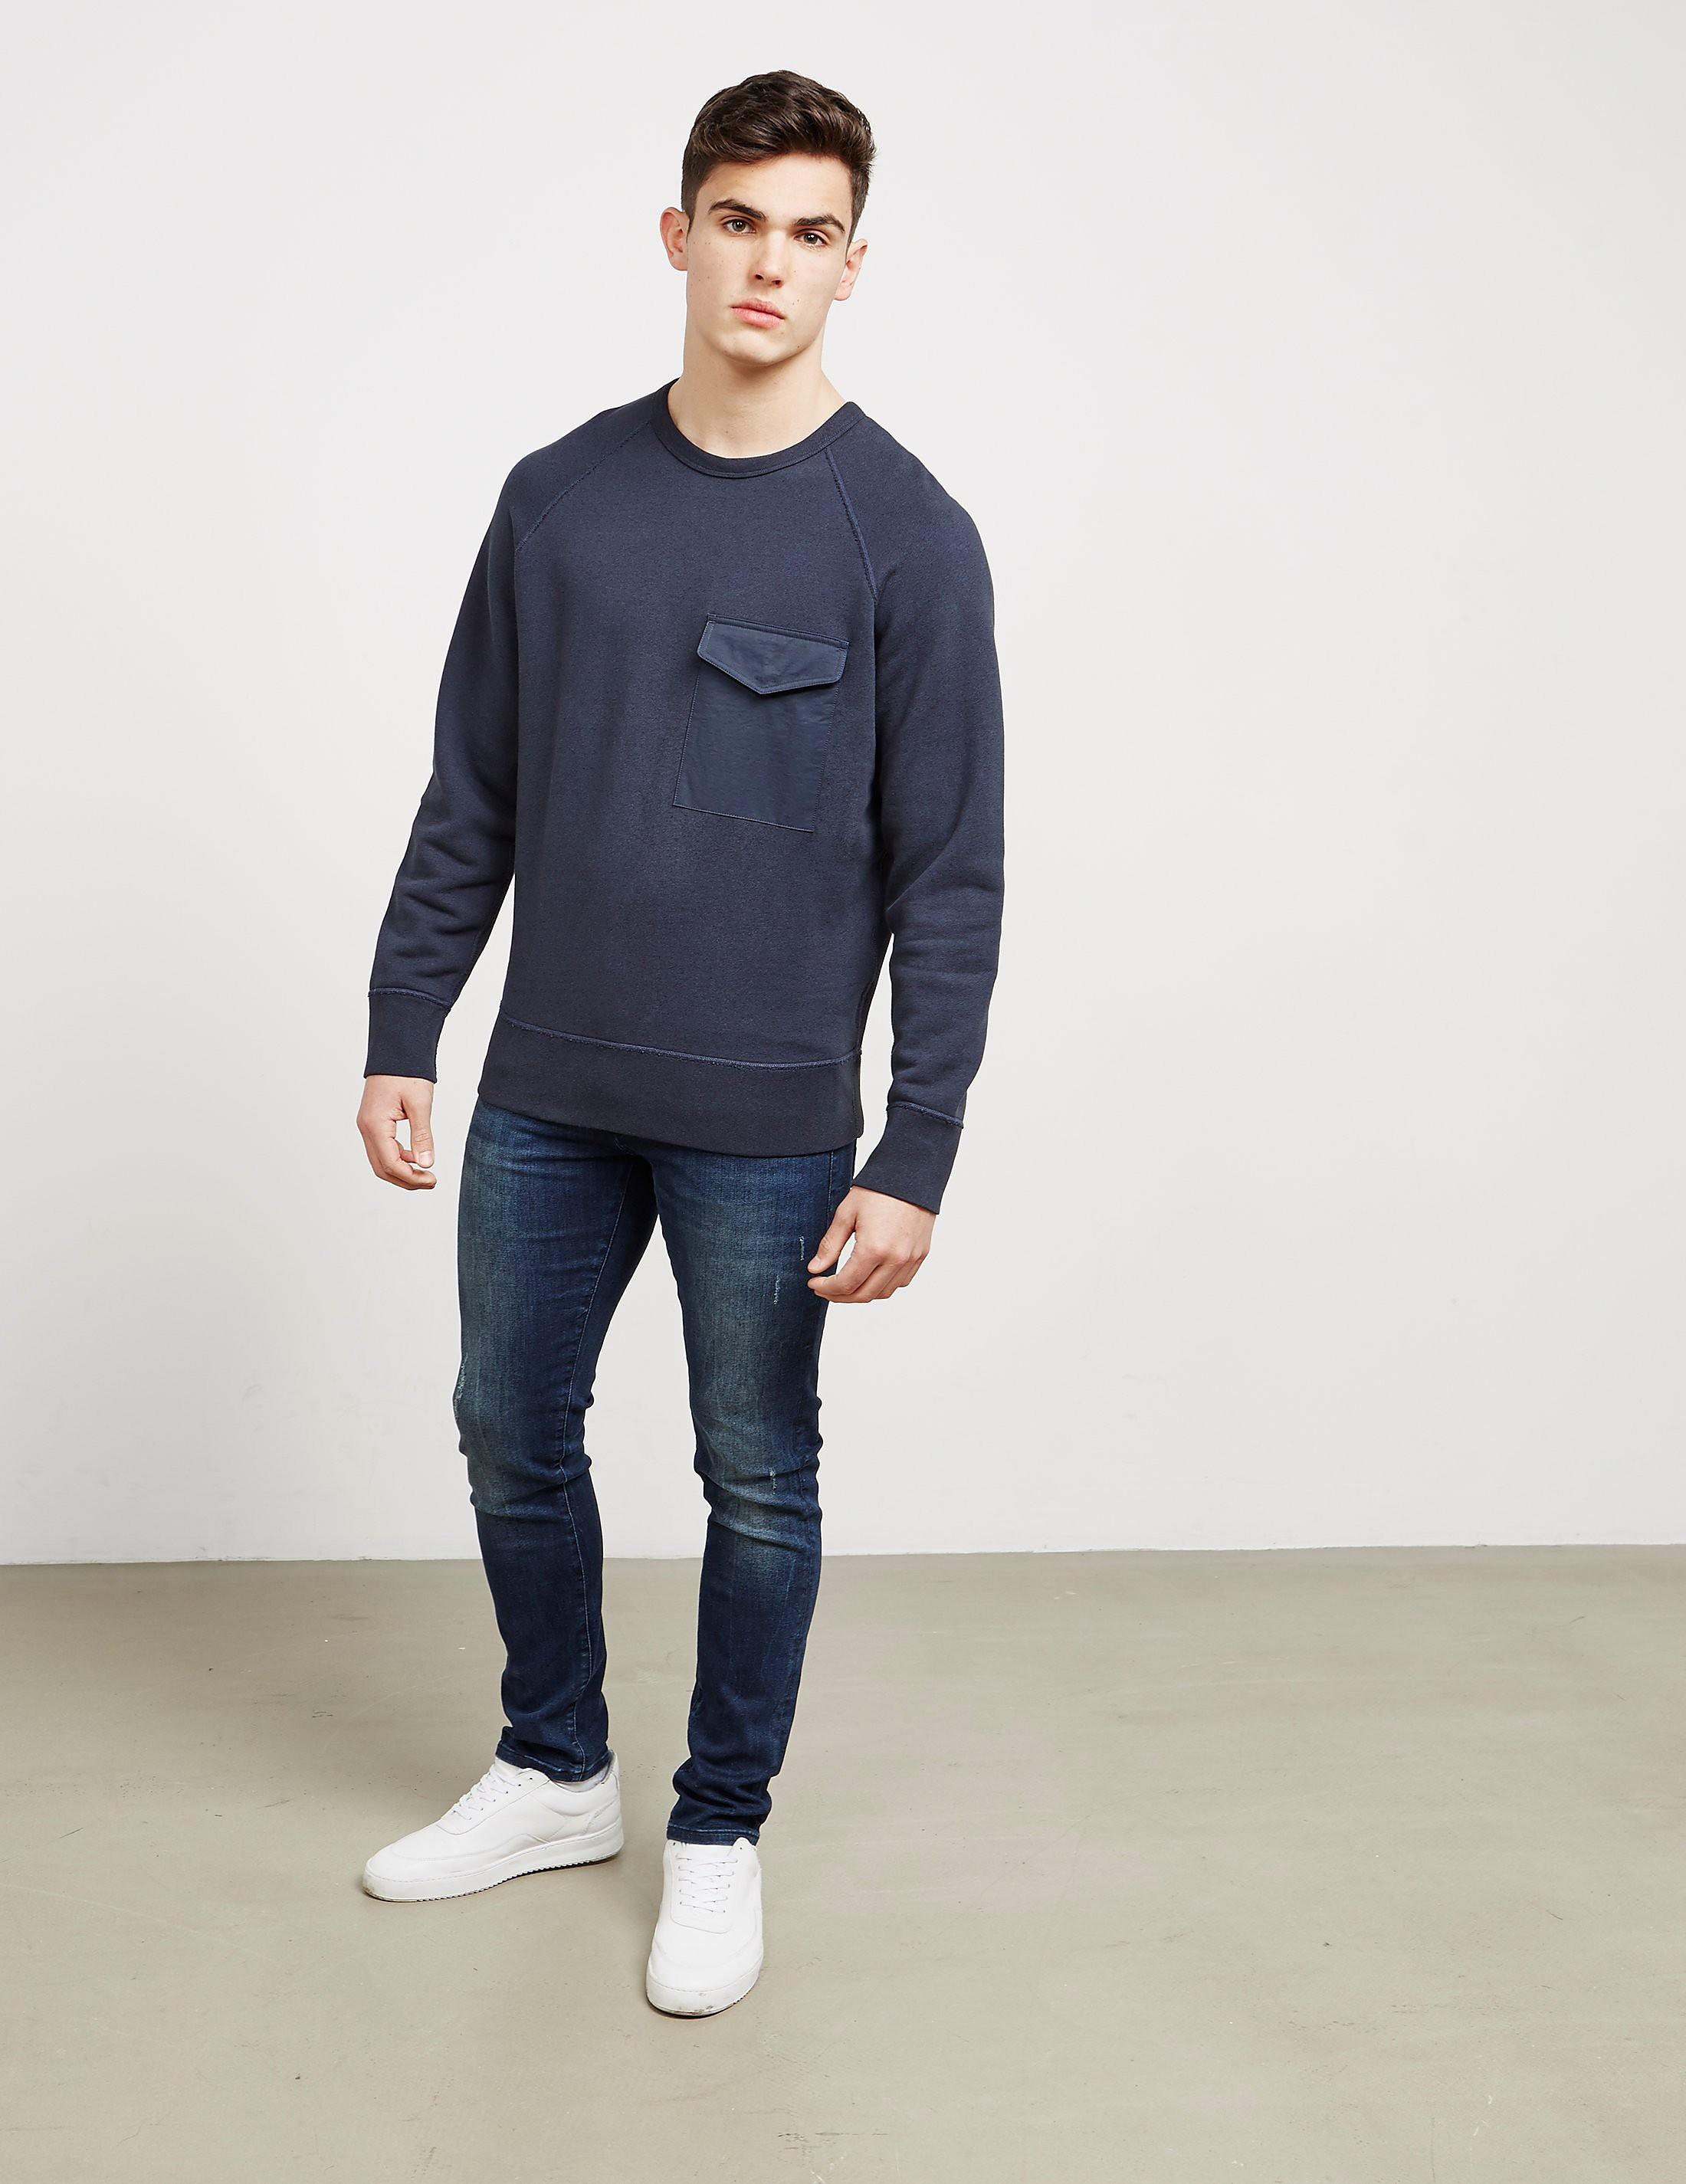 Rag & Bone Pocket Crew Neck Sweatshirt